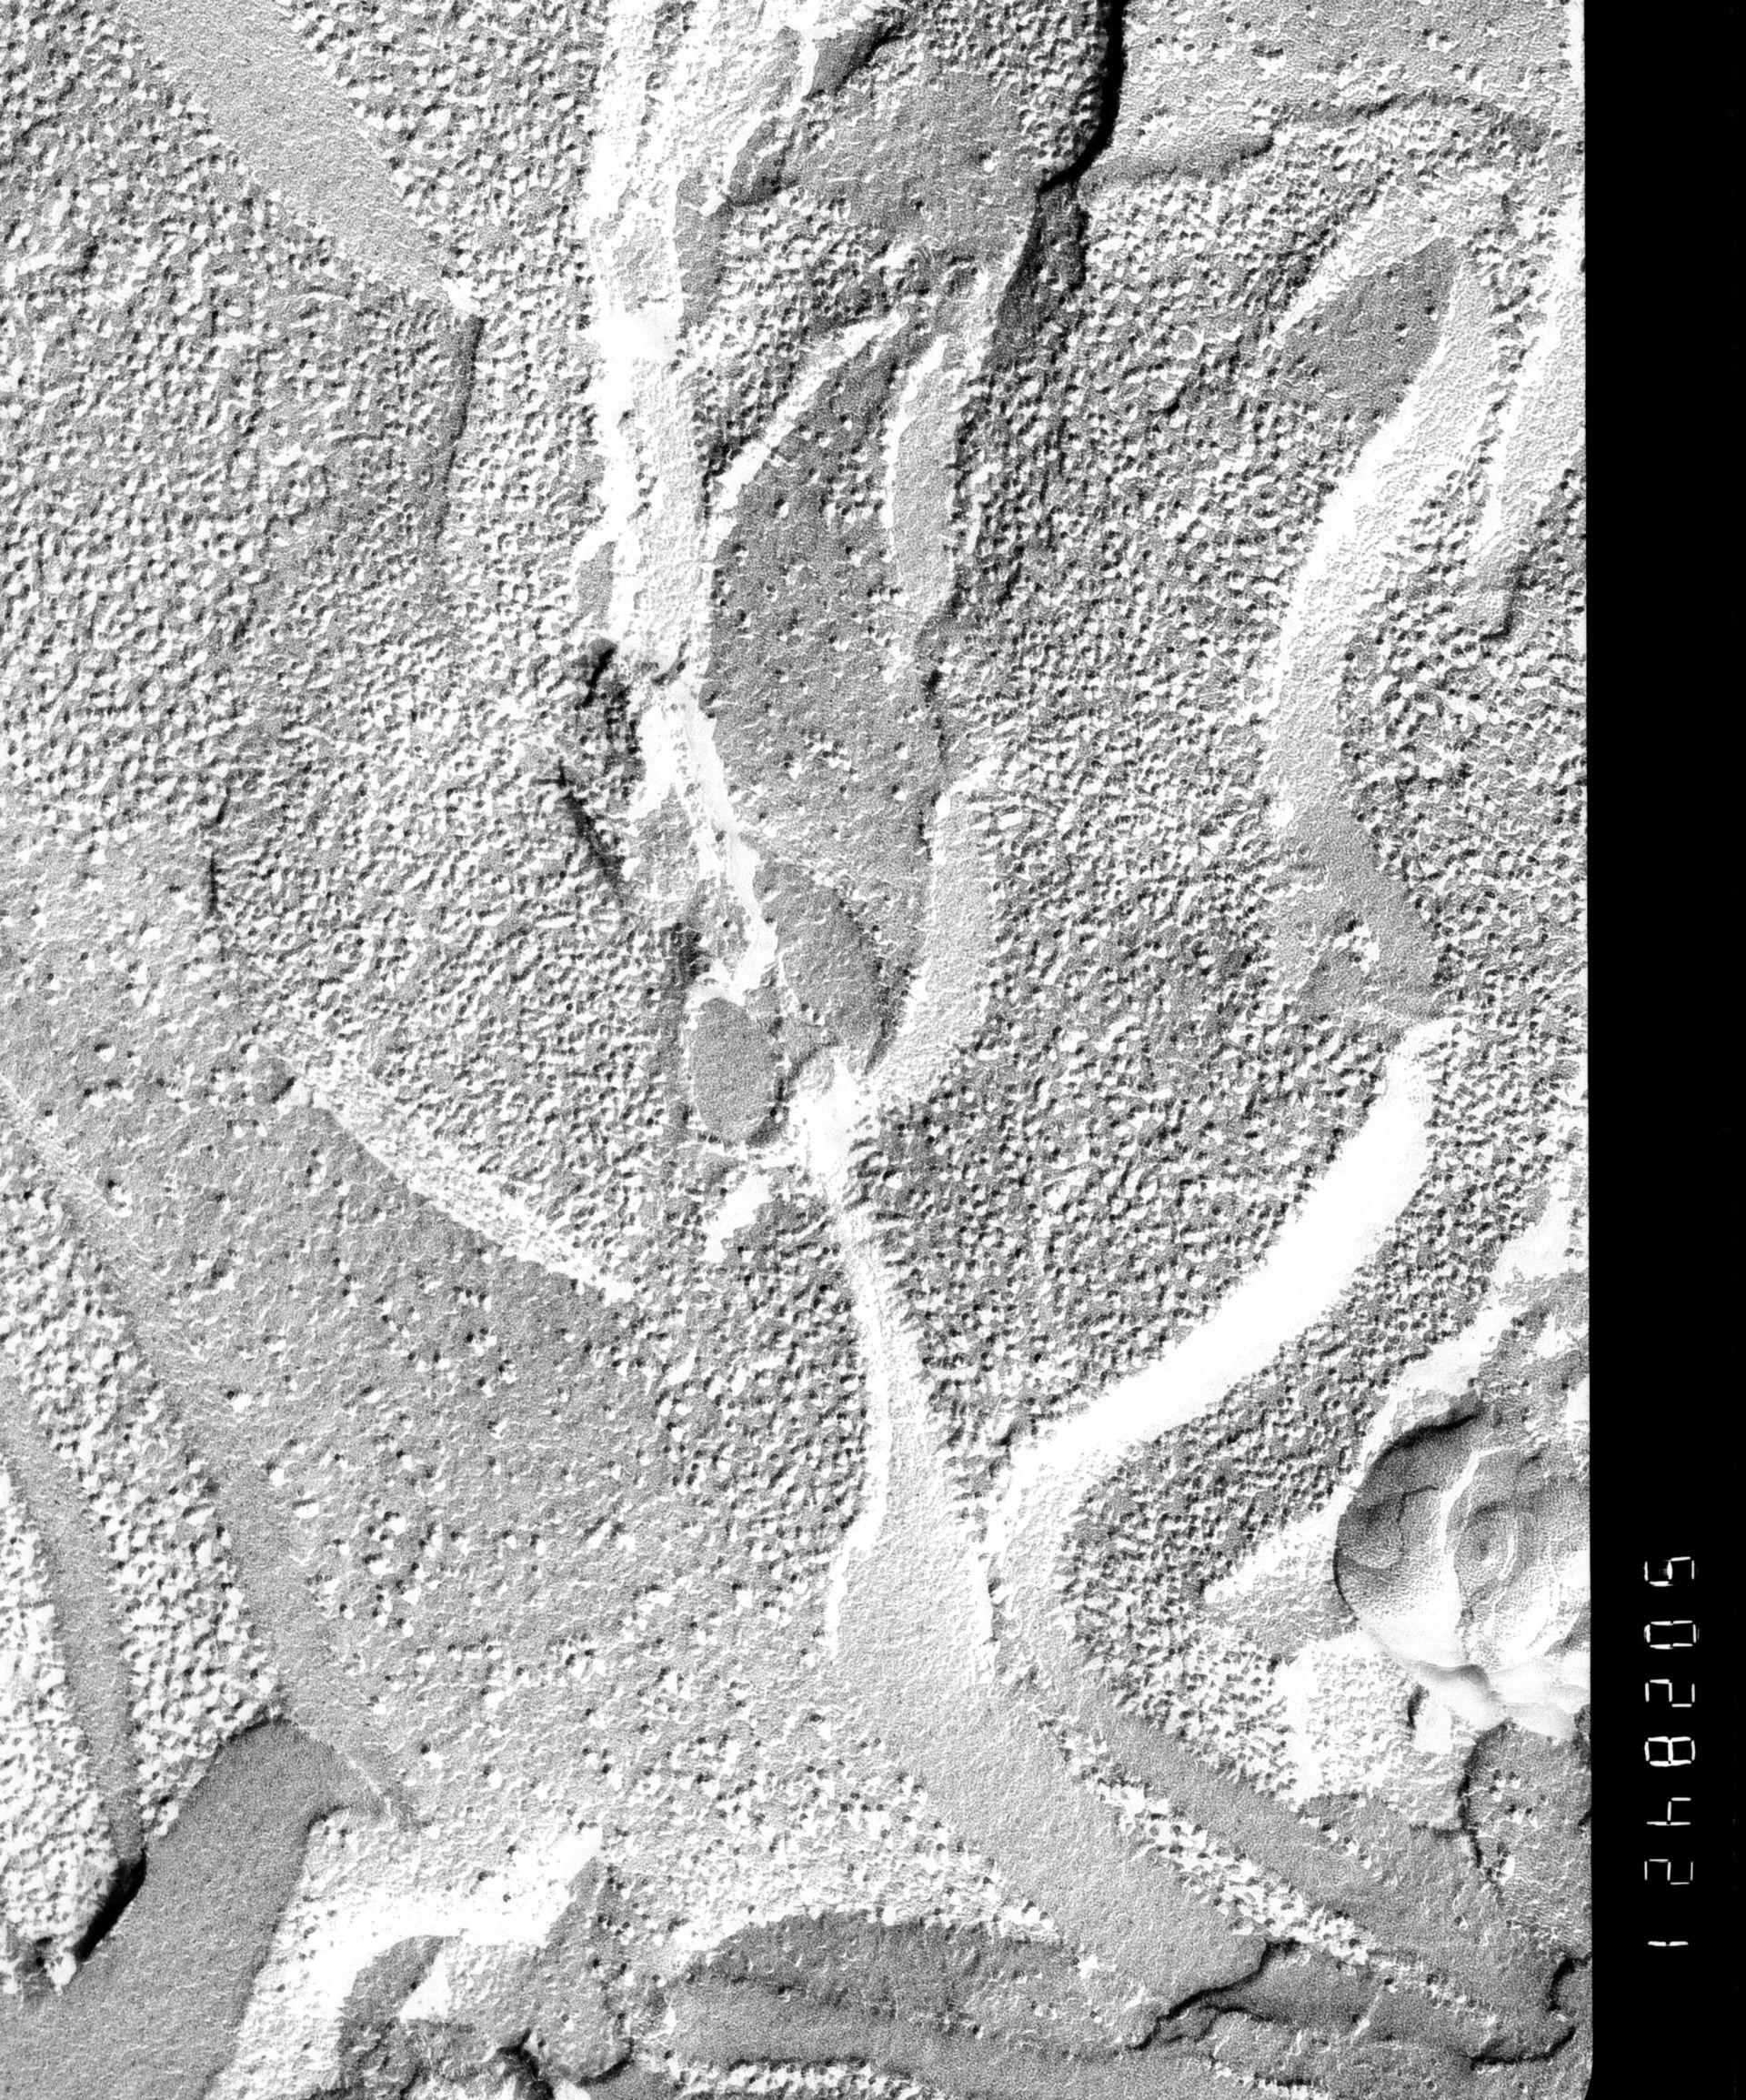 Prochloron (Thylakoid) - CIL:16228